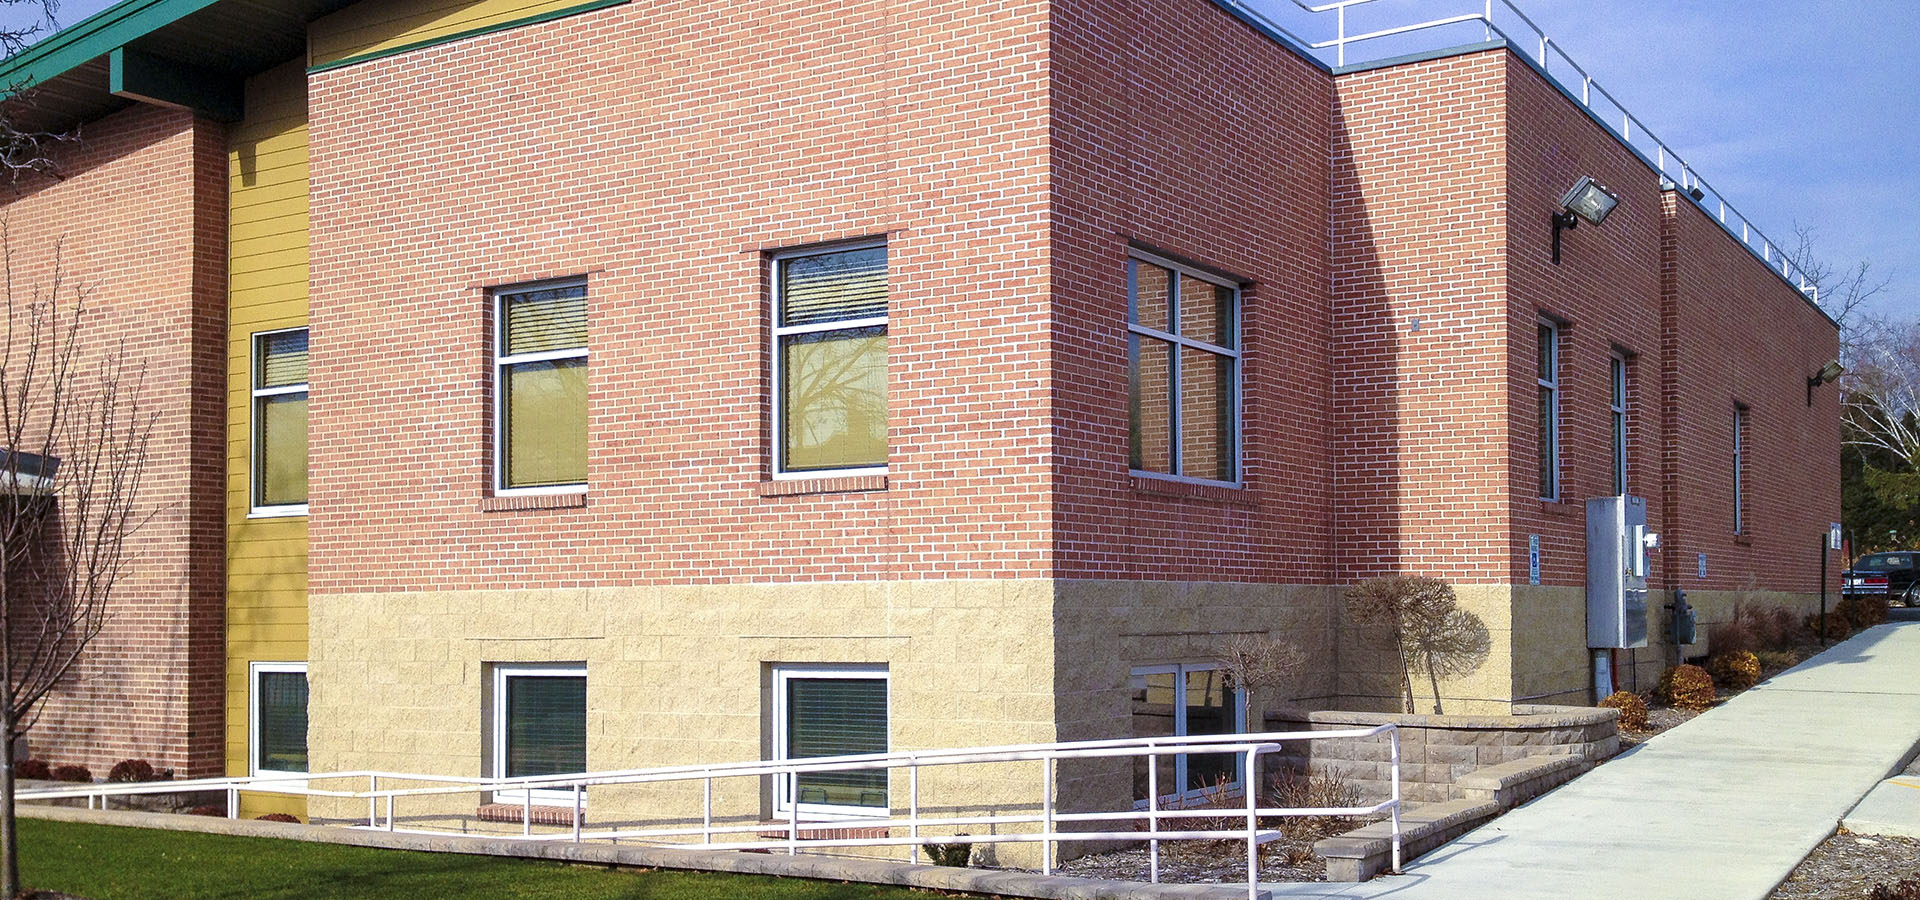 Orthopaedic Associates of Manitowoc, Ltd  Manitowoc, Wisconsin